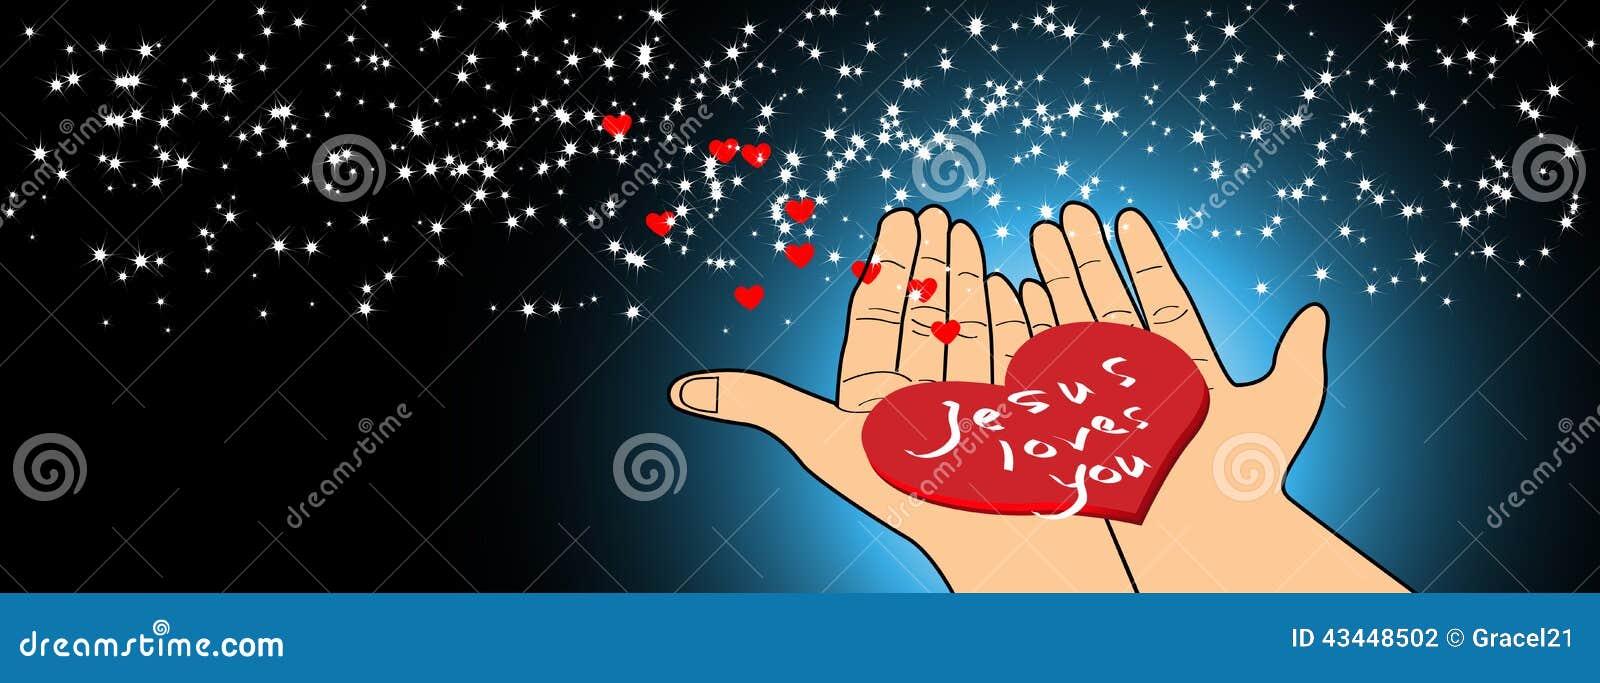 Jesus loves you stock vector. Illustration of bible, hope ...